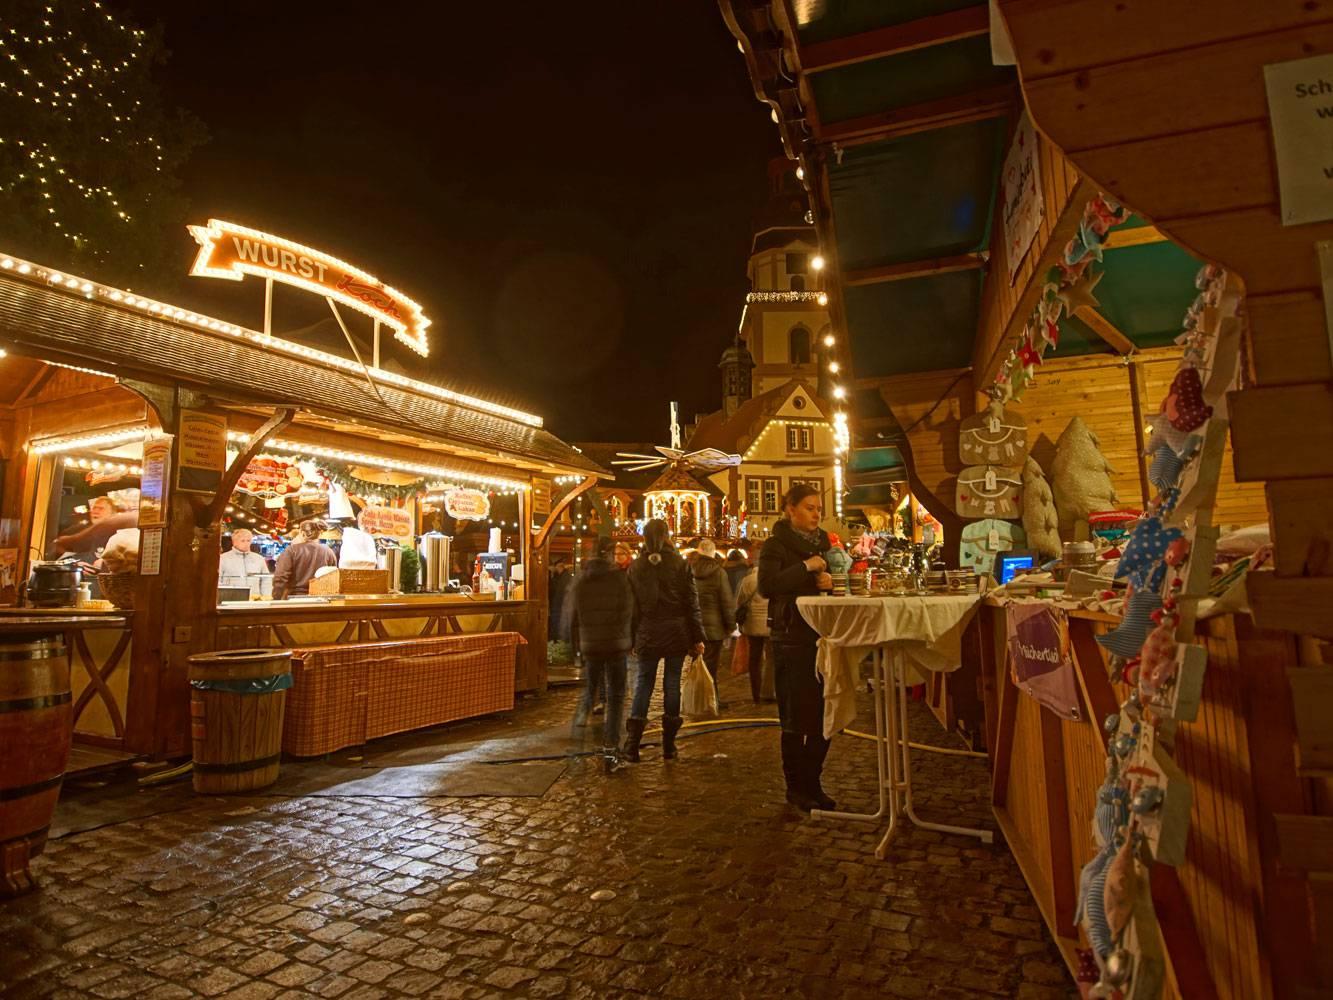 Weihnachtsmarkt Otzberg.Handyemulator